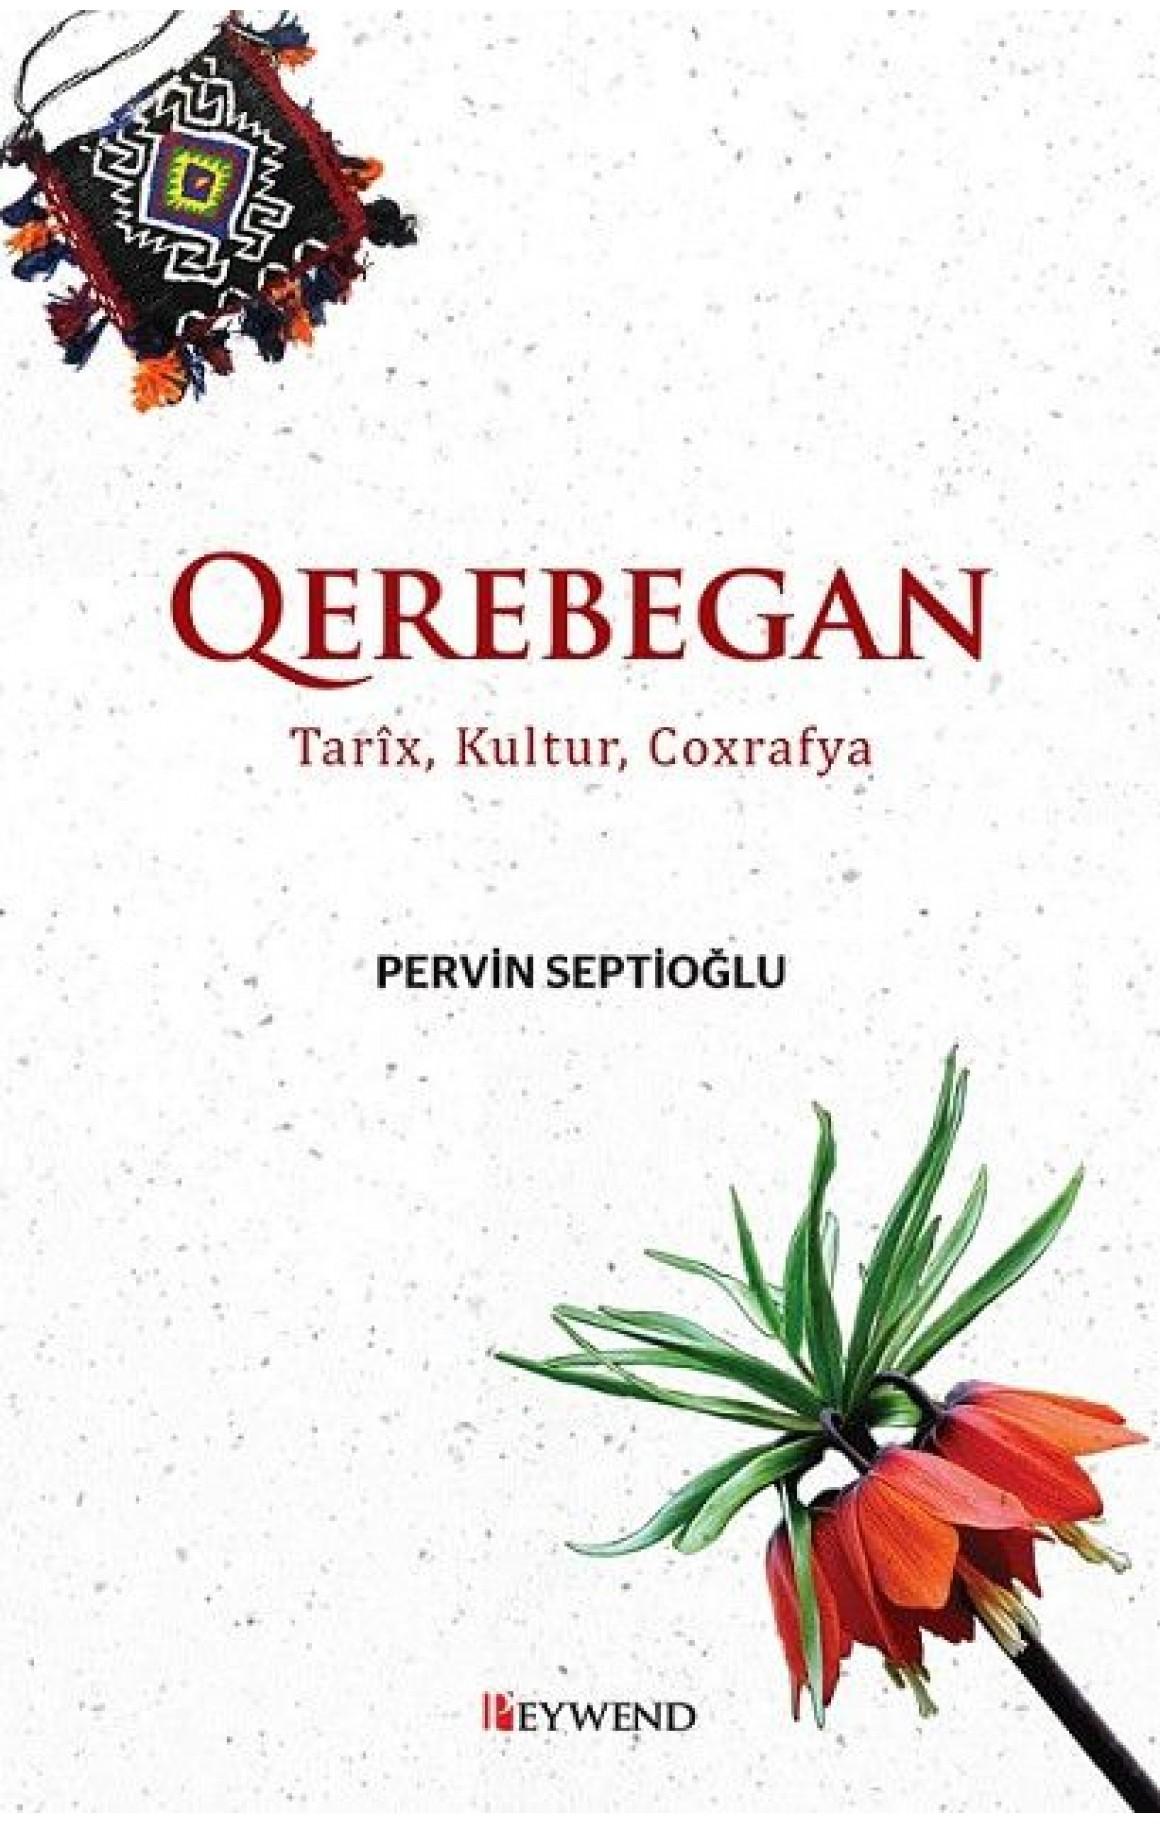 QEREBEGAN Tarîx, Kultur, Coxrafya